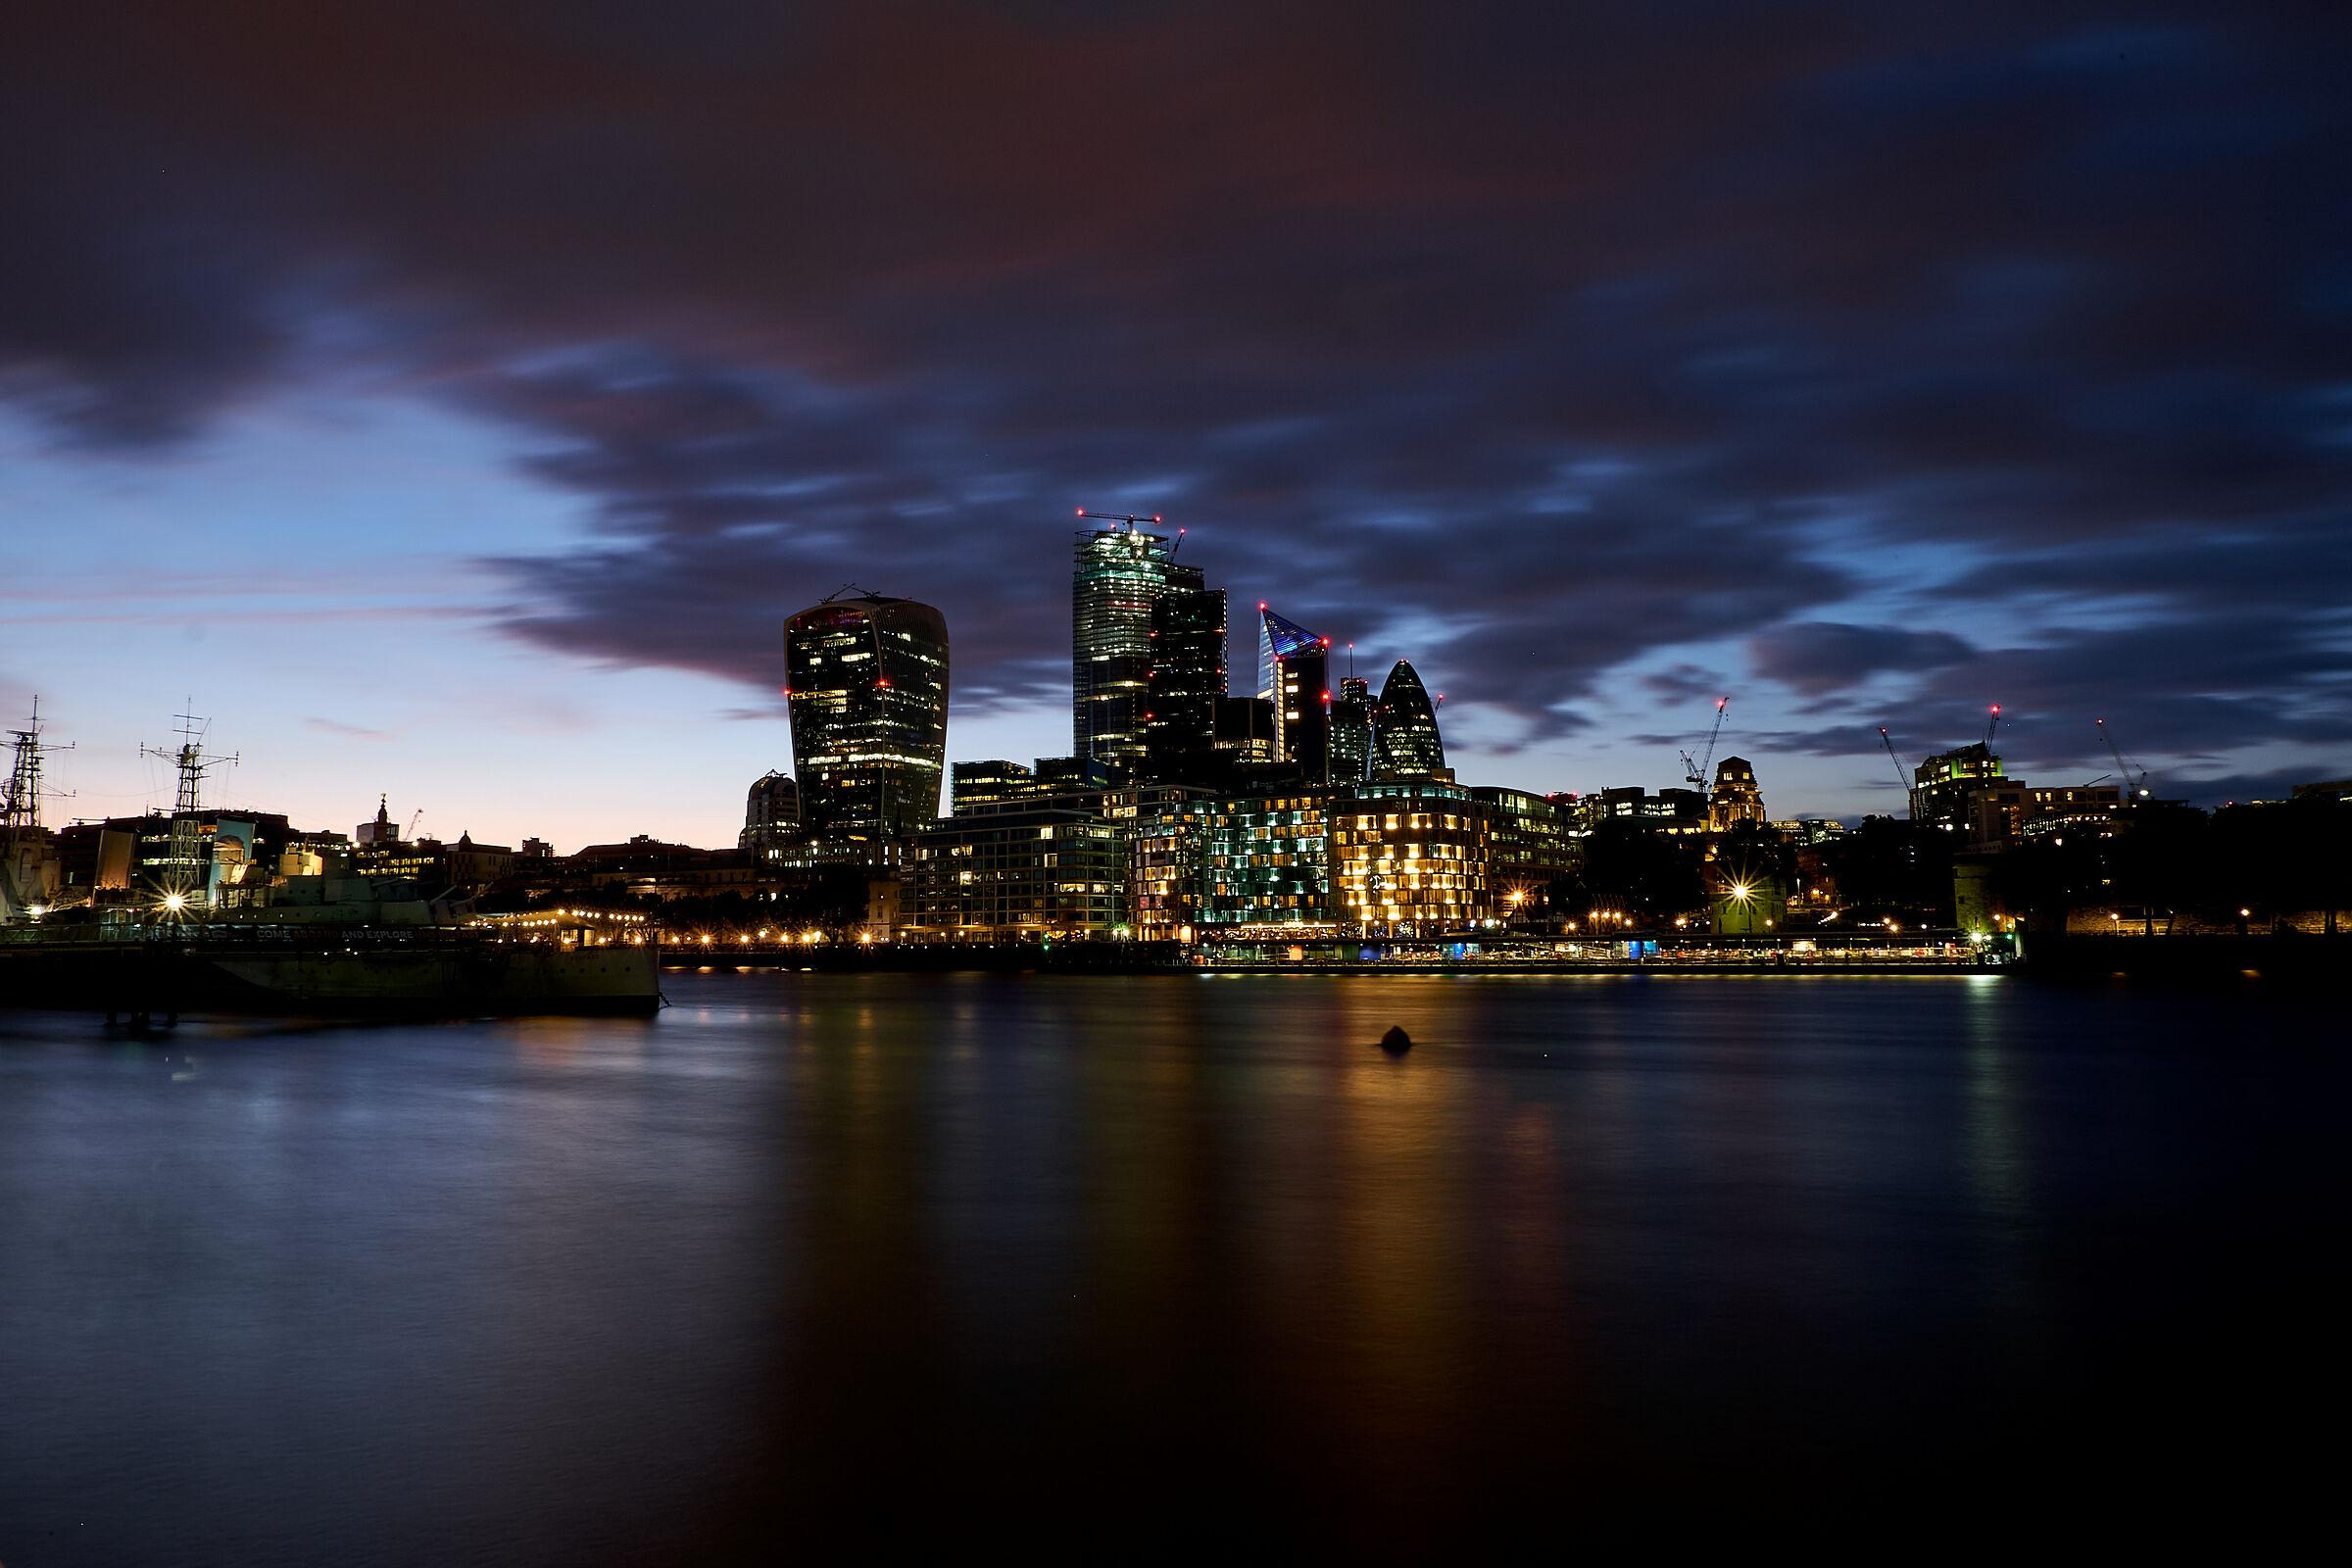 London by night...